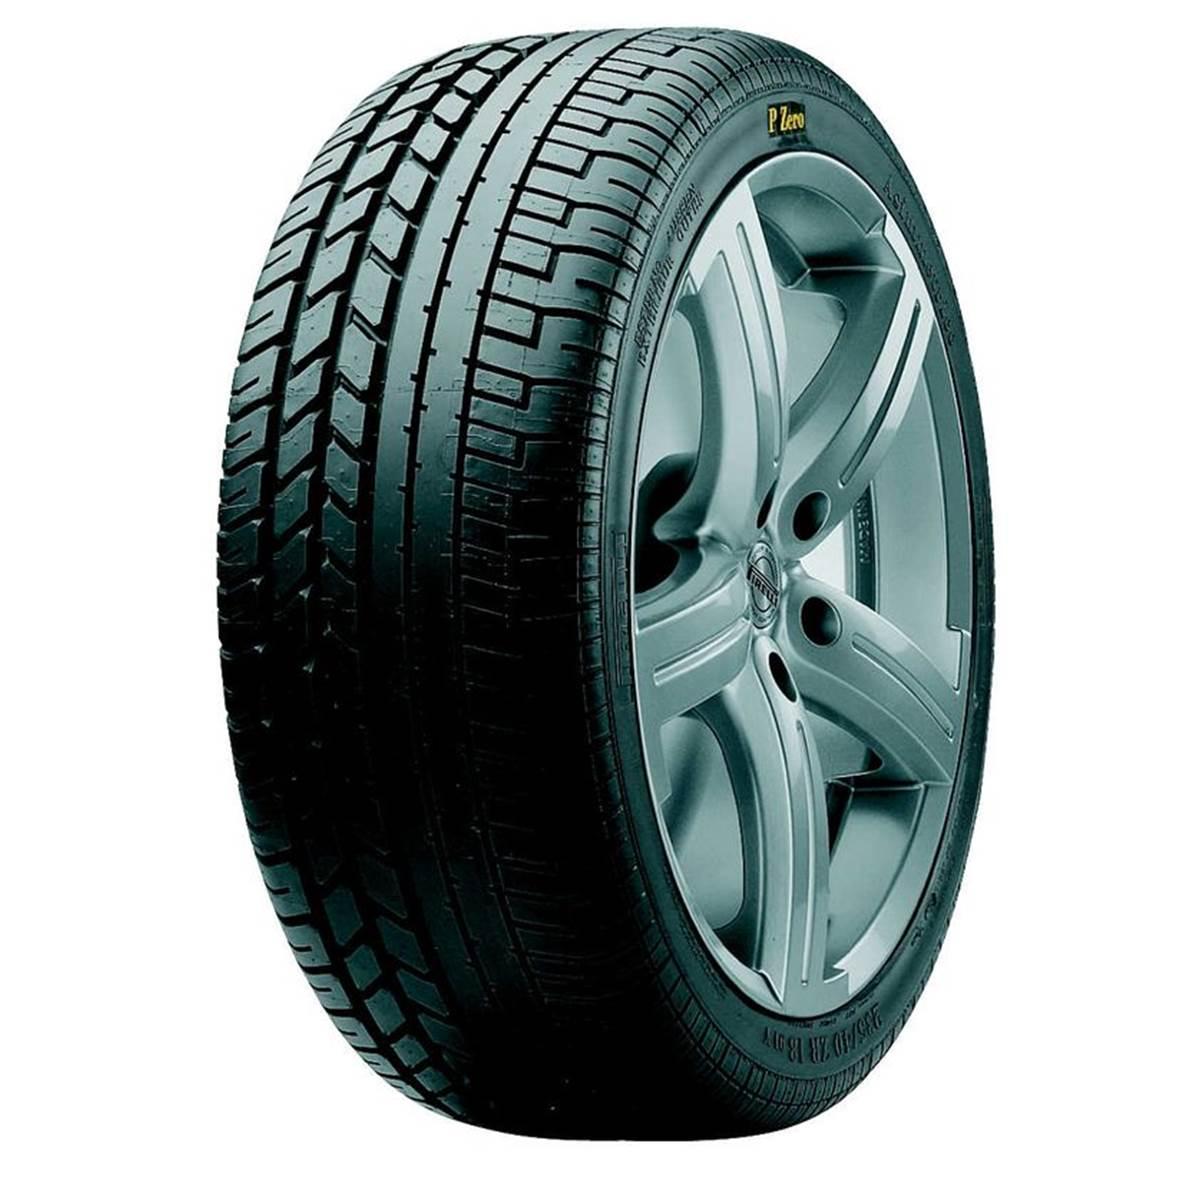 Pneu Pirelli 245/50R17 99Y Pzero Asimmetrico